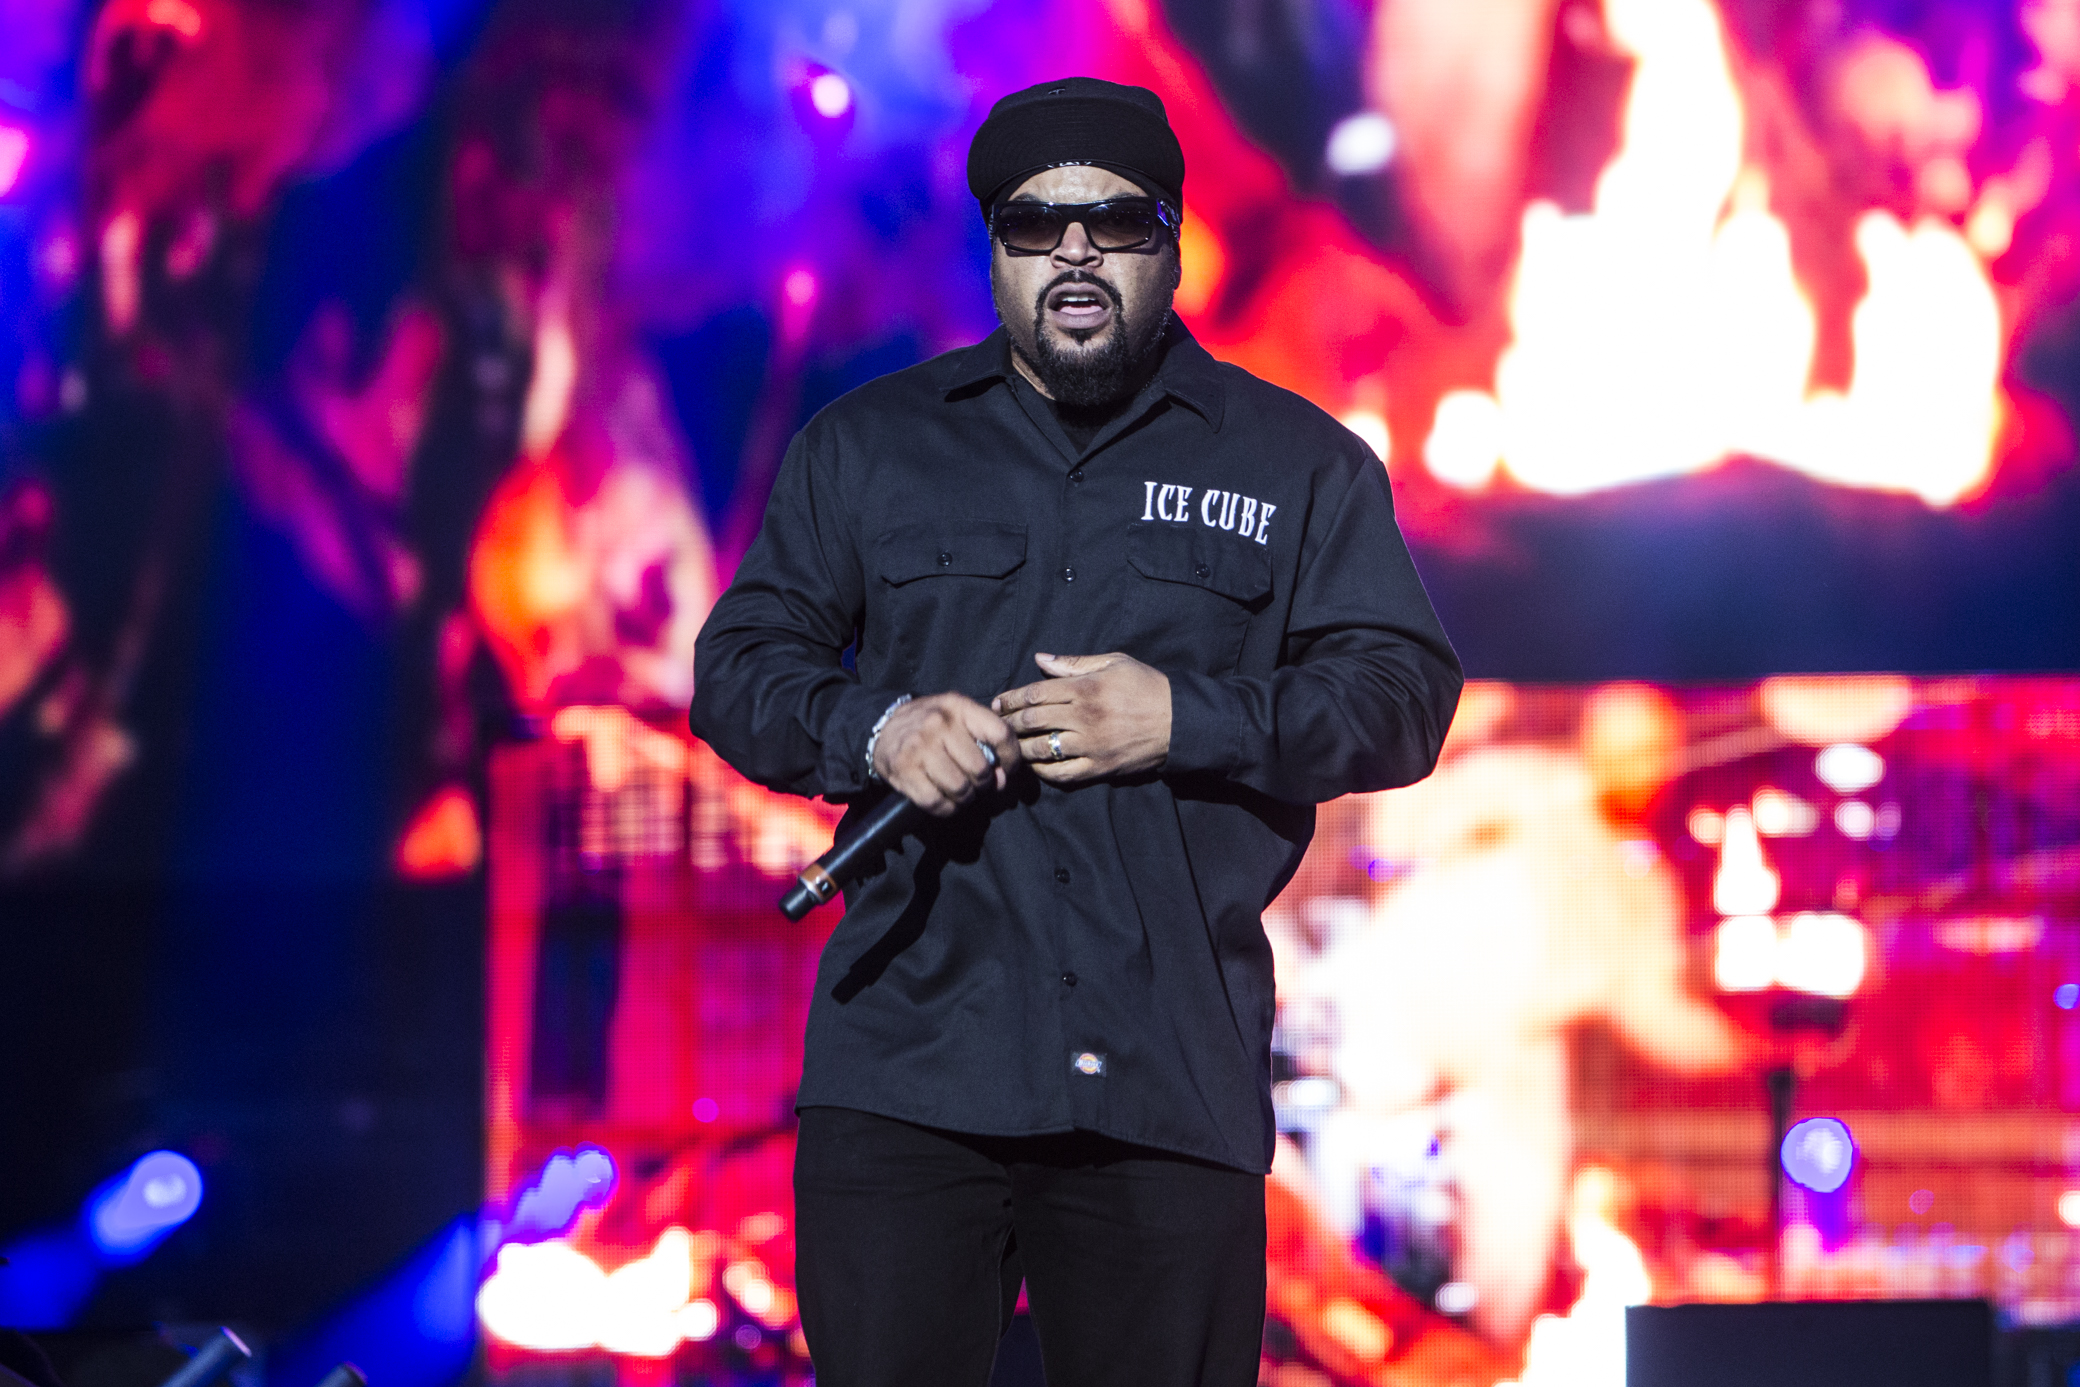 ice cube 5 Ice Cube.5